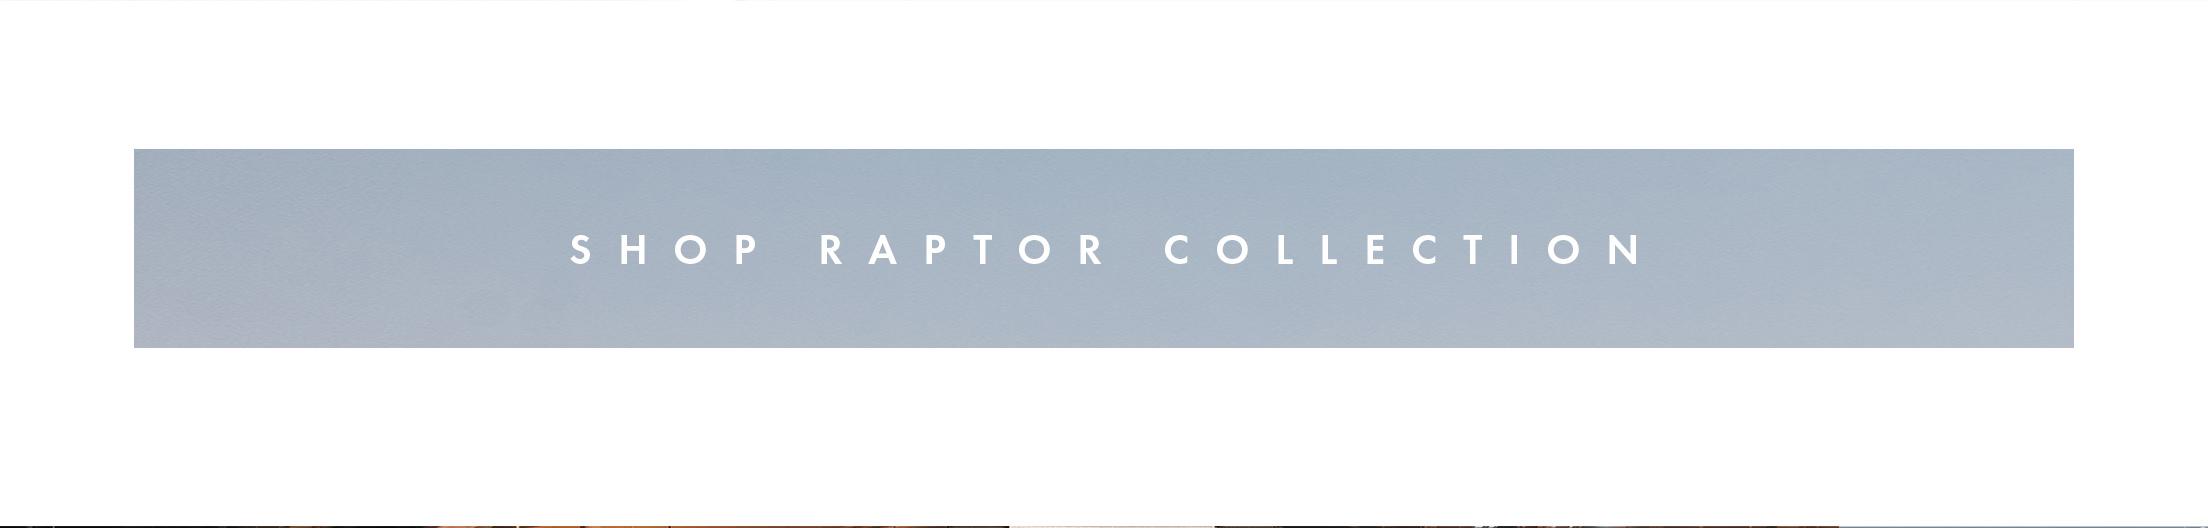 Shop Raptor Collection